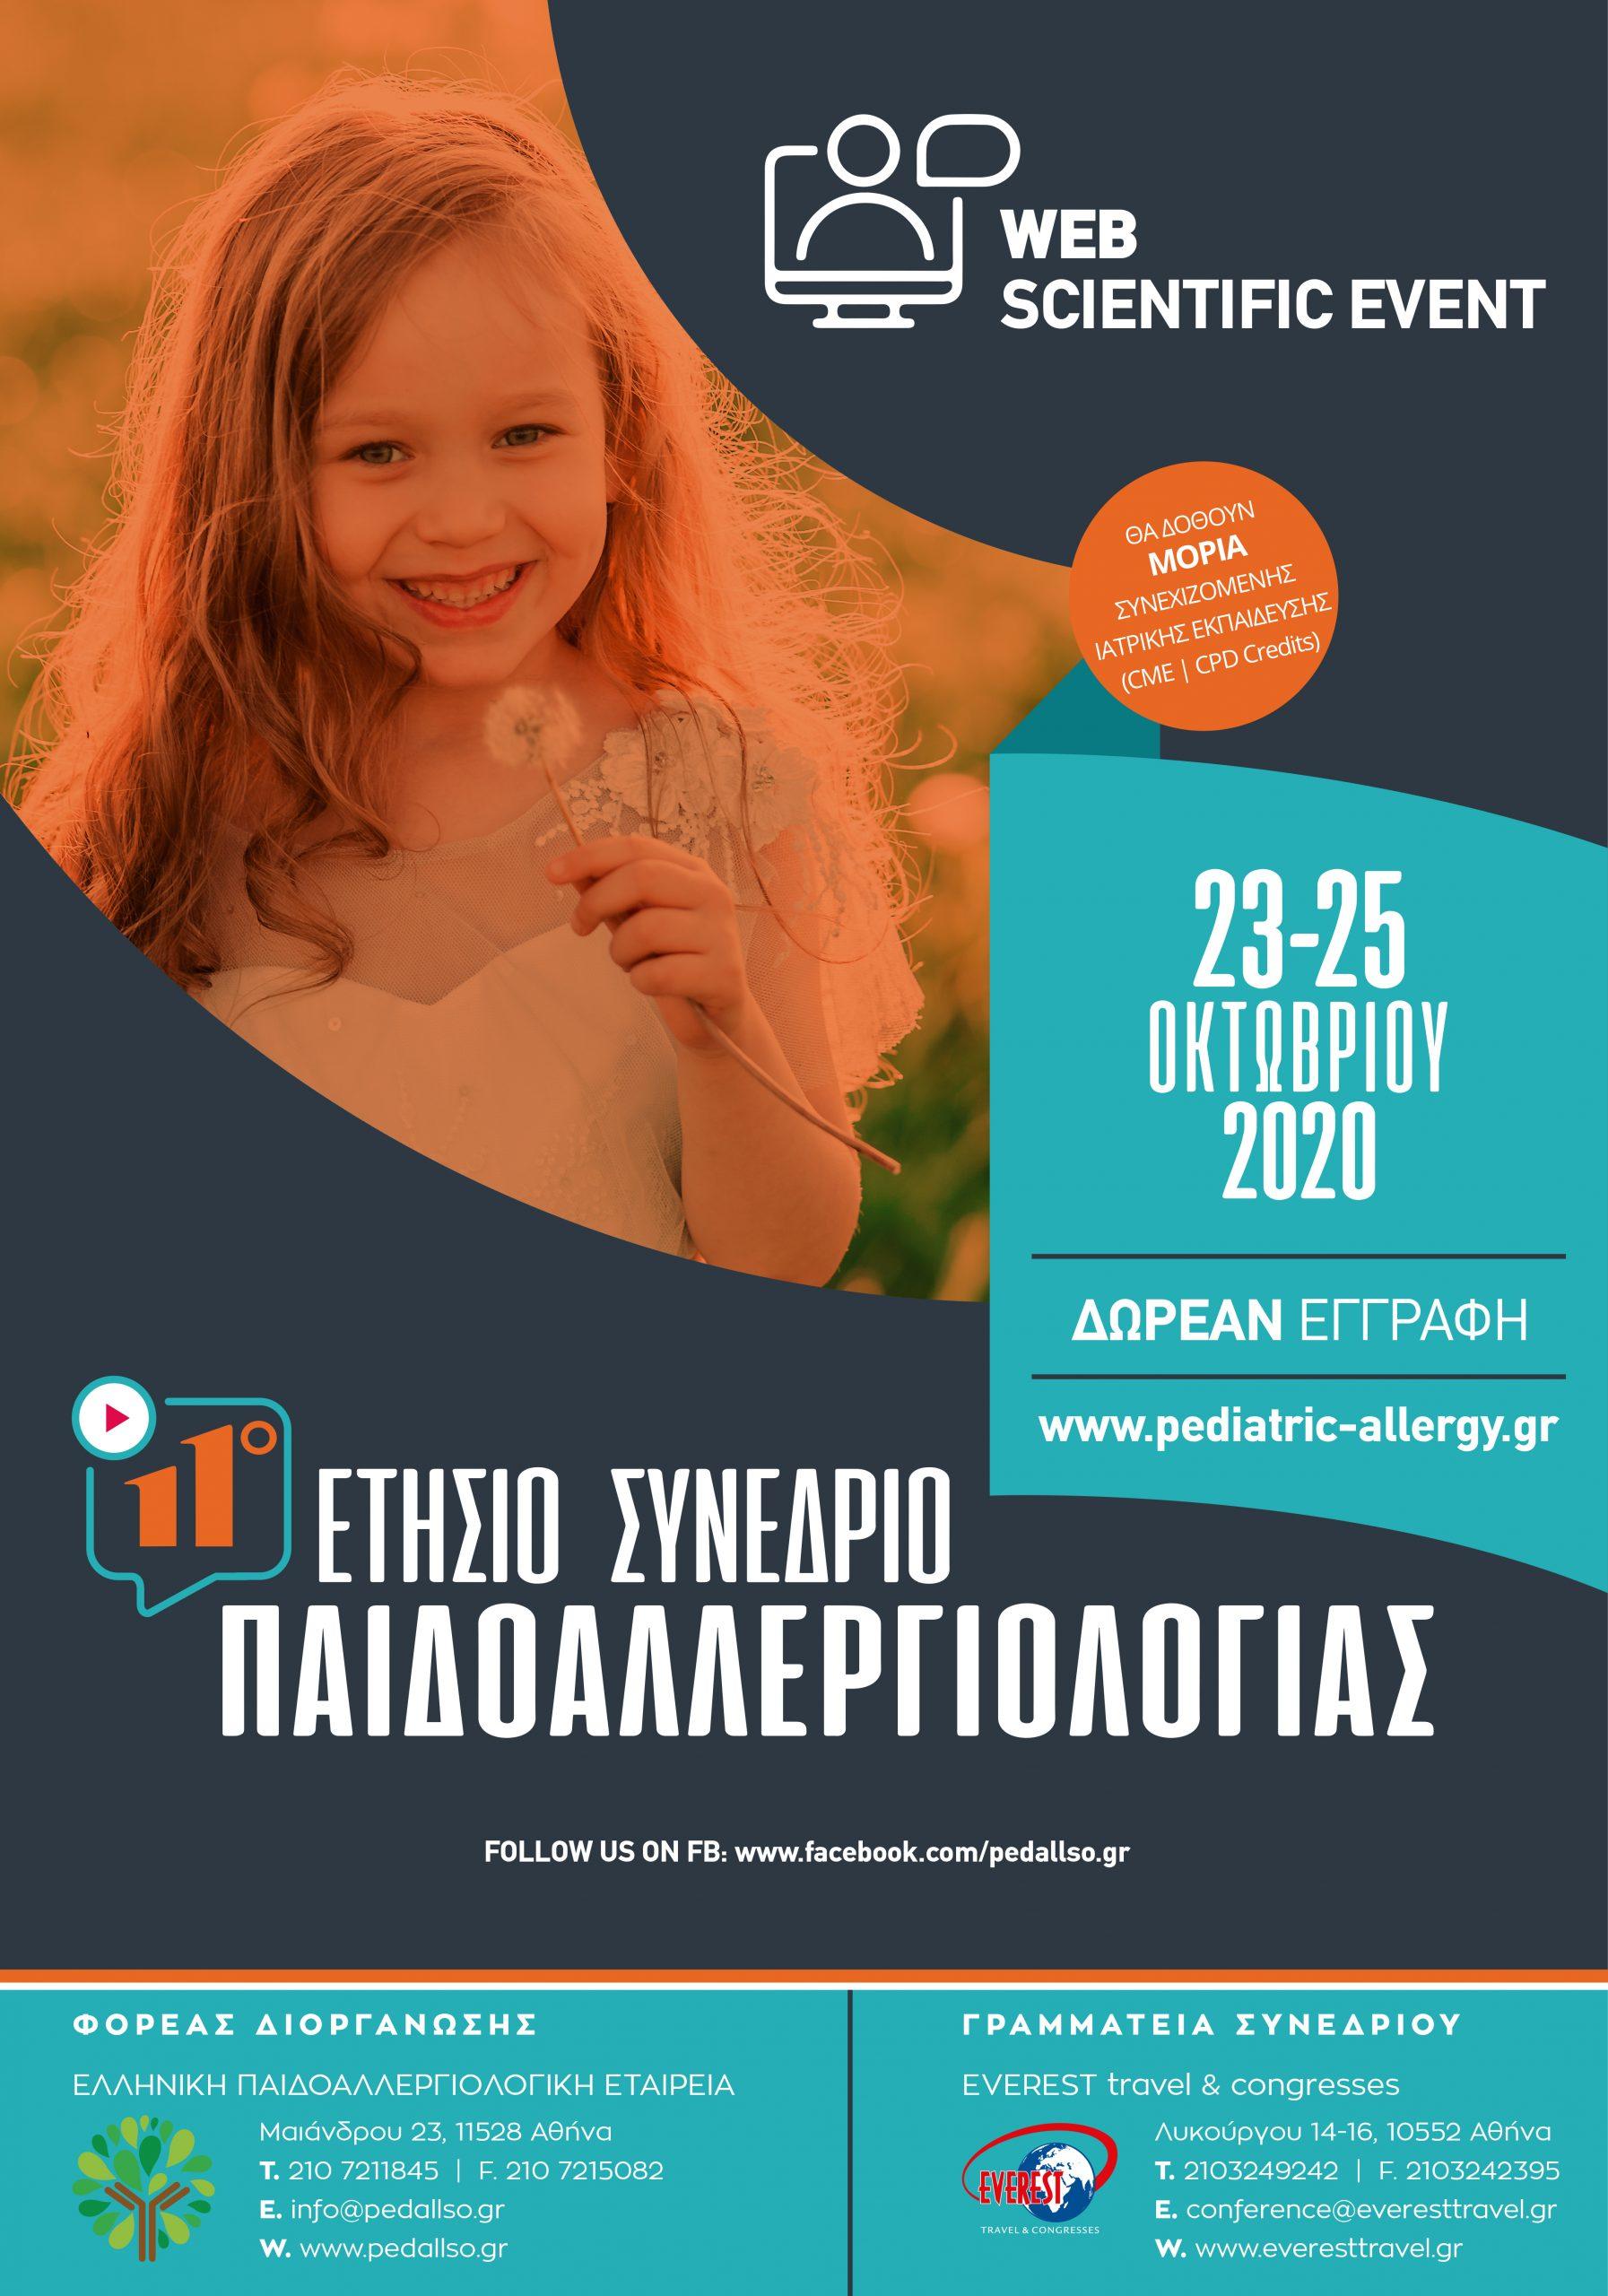 11o Ετήσιο Συνέδριο Παιδοαλλεργιολογίας